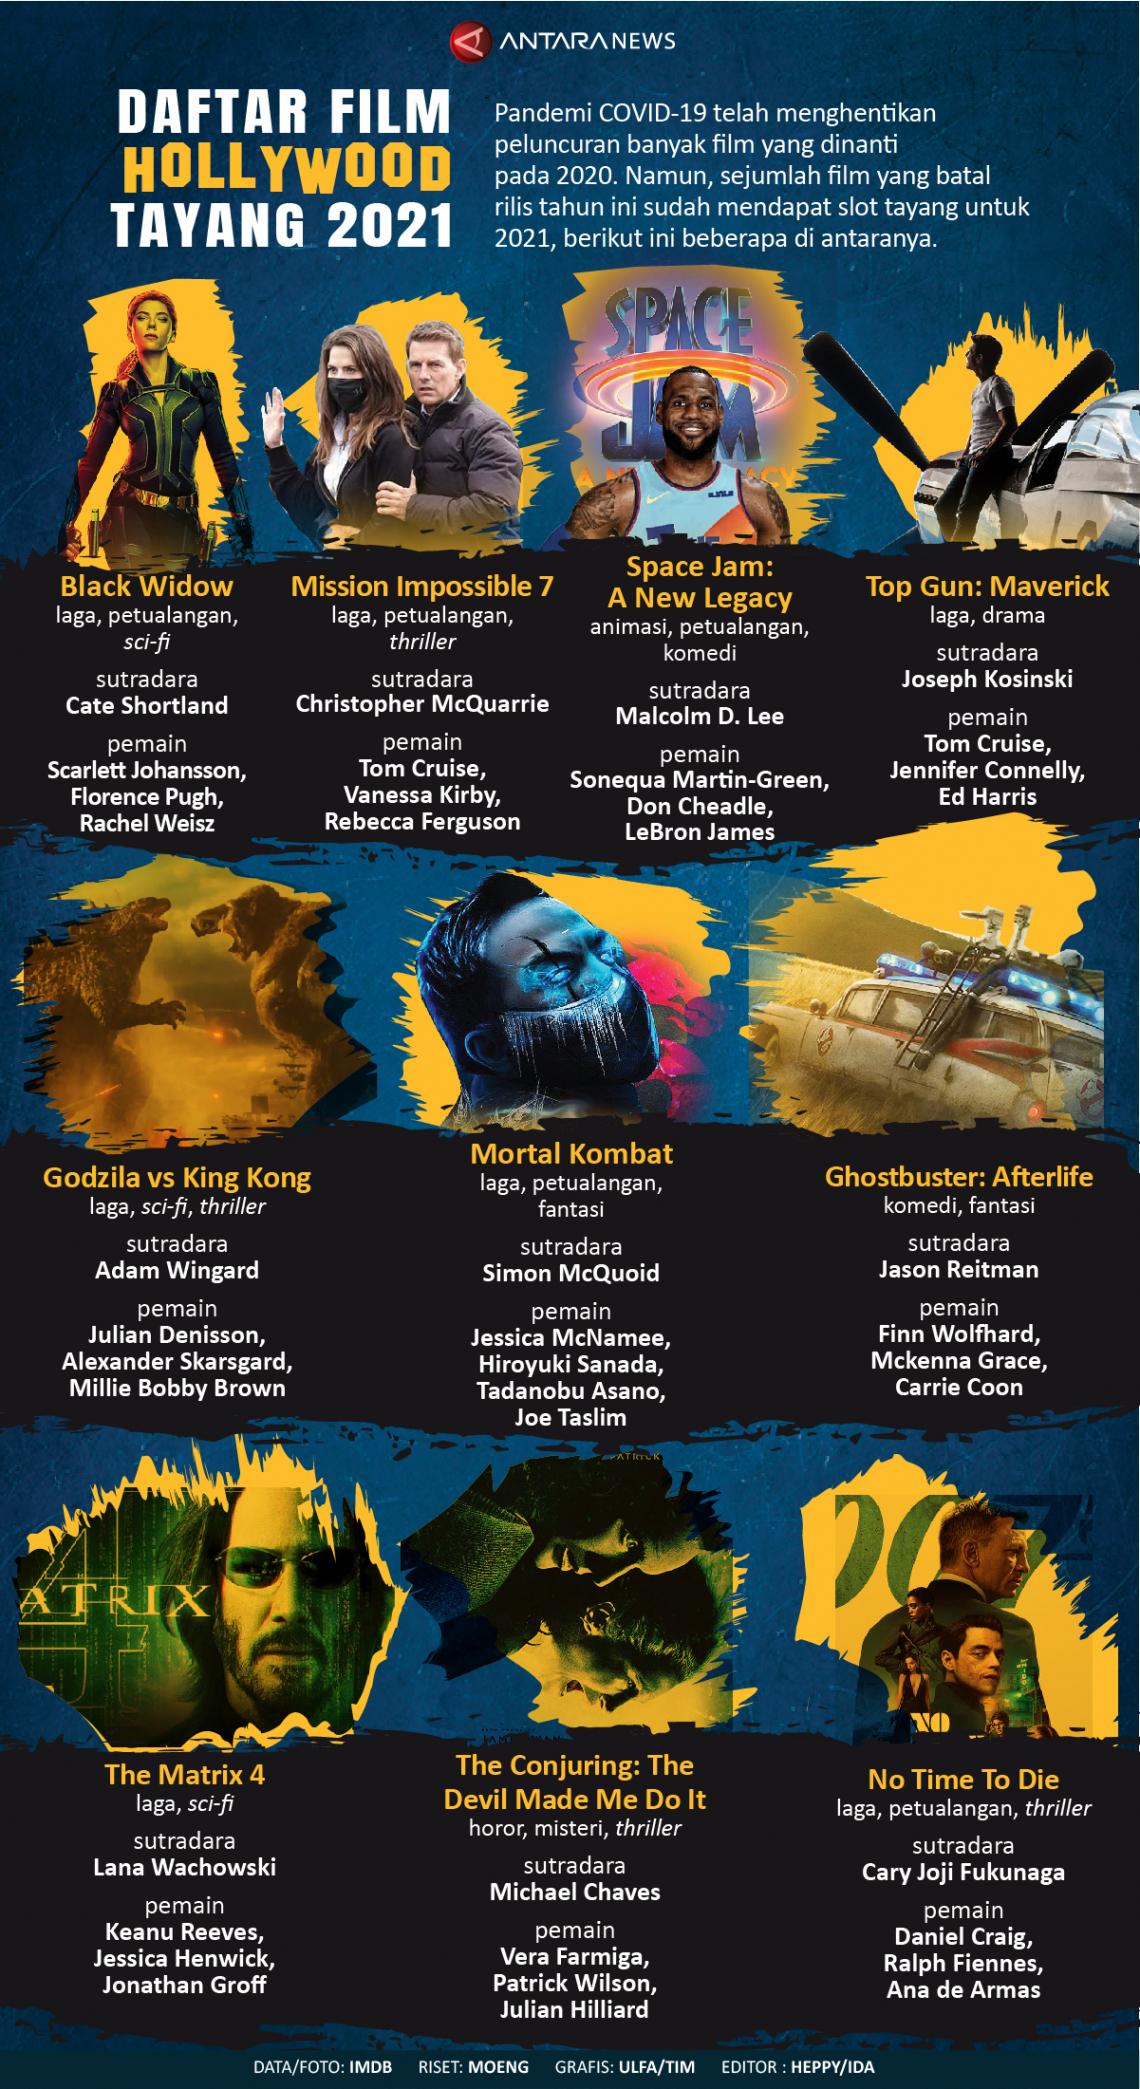 Daftar film Hollywood tayang 2021